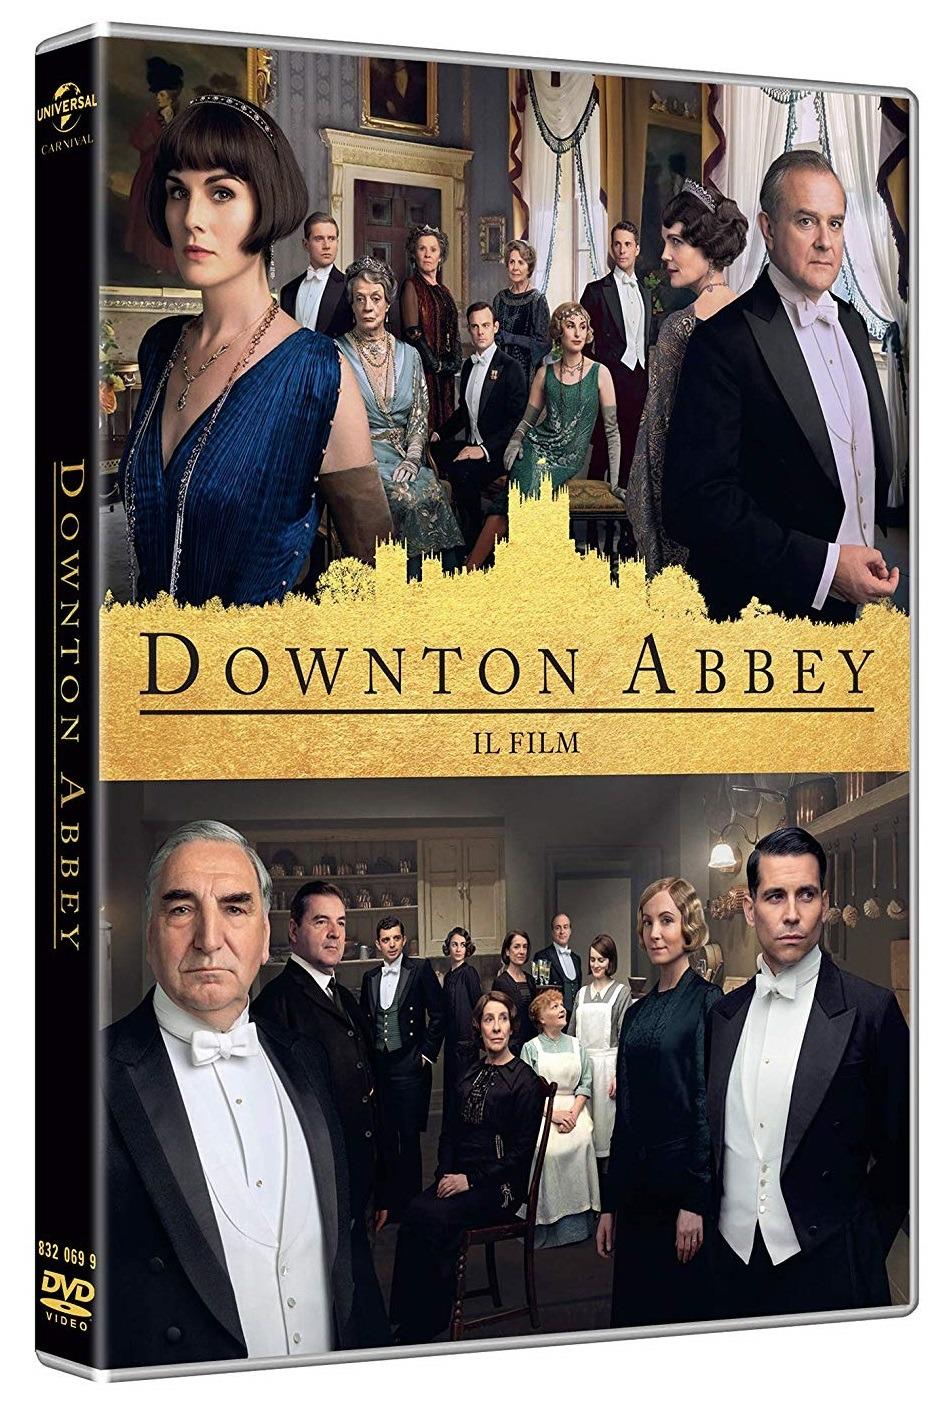 Downton Abbey - Il Film - Middleton,goode,smith,dockery,phillips,mcgovern,leech,carmichael,froggatt - Film - UNIVERSAL - 5053083206994 -